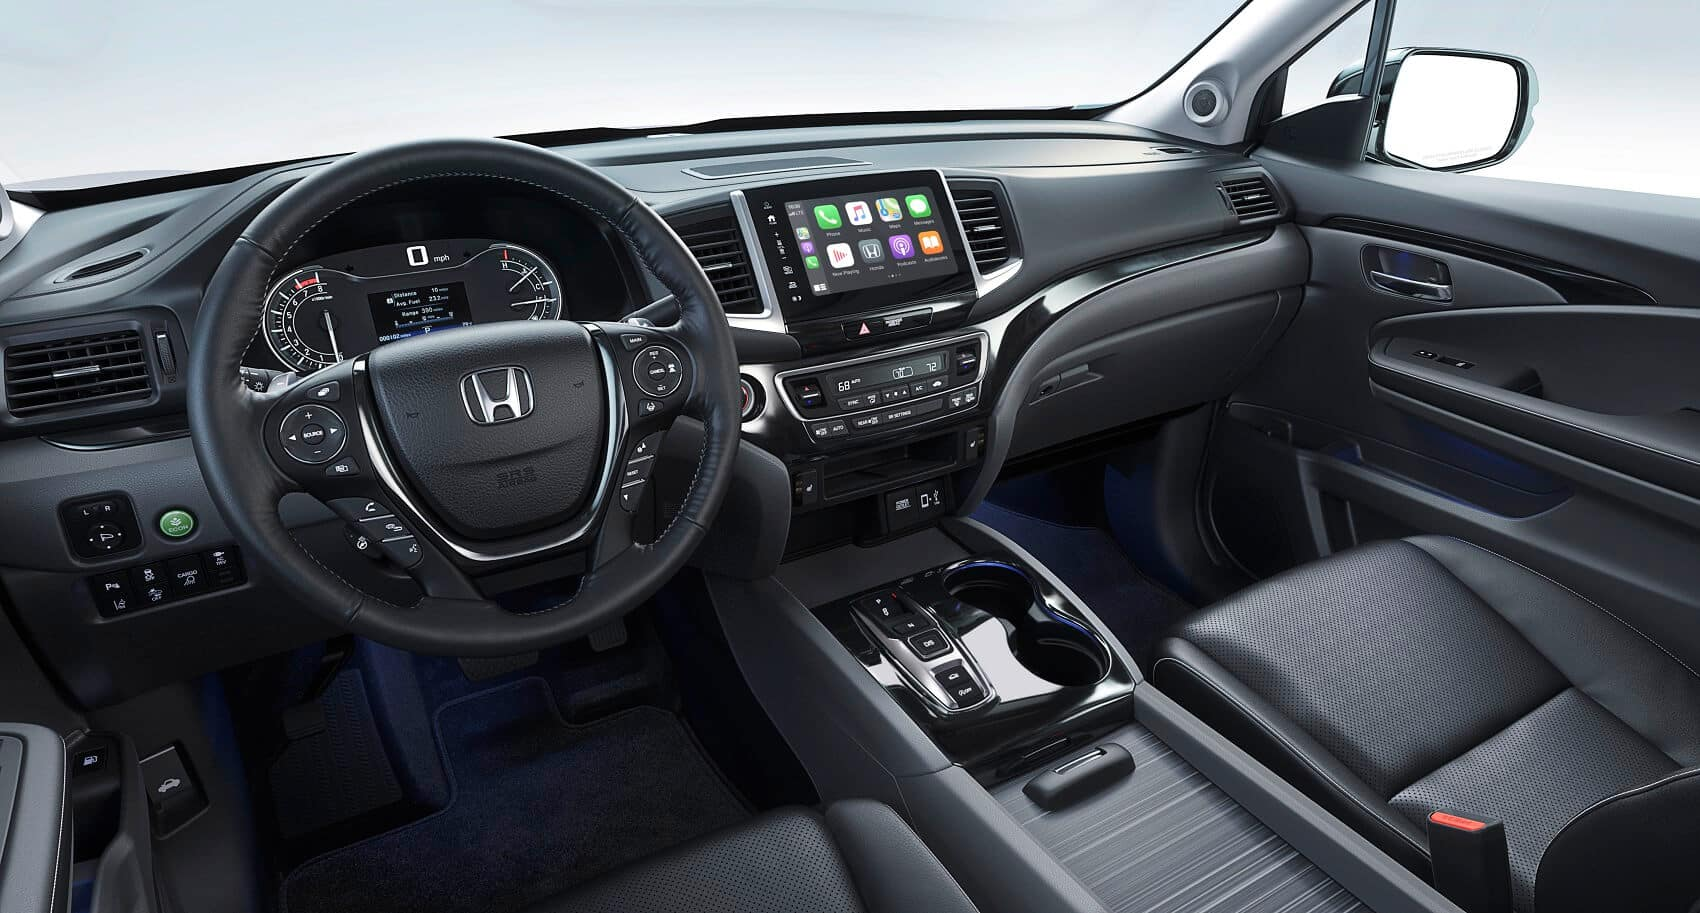 2020 Honda Ridgeline Interior Apple CarPlay® Technology